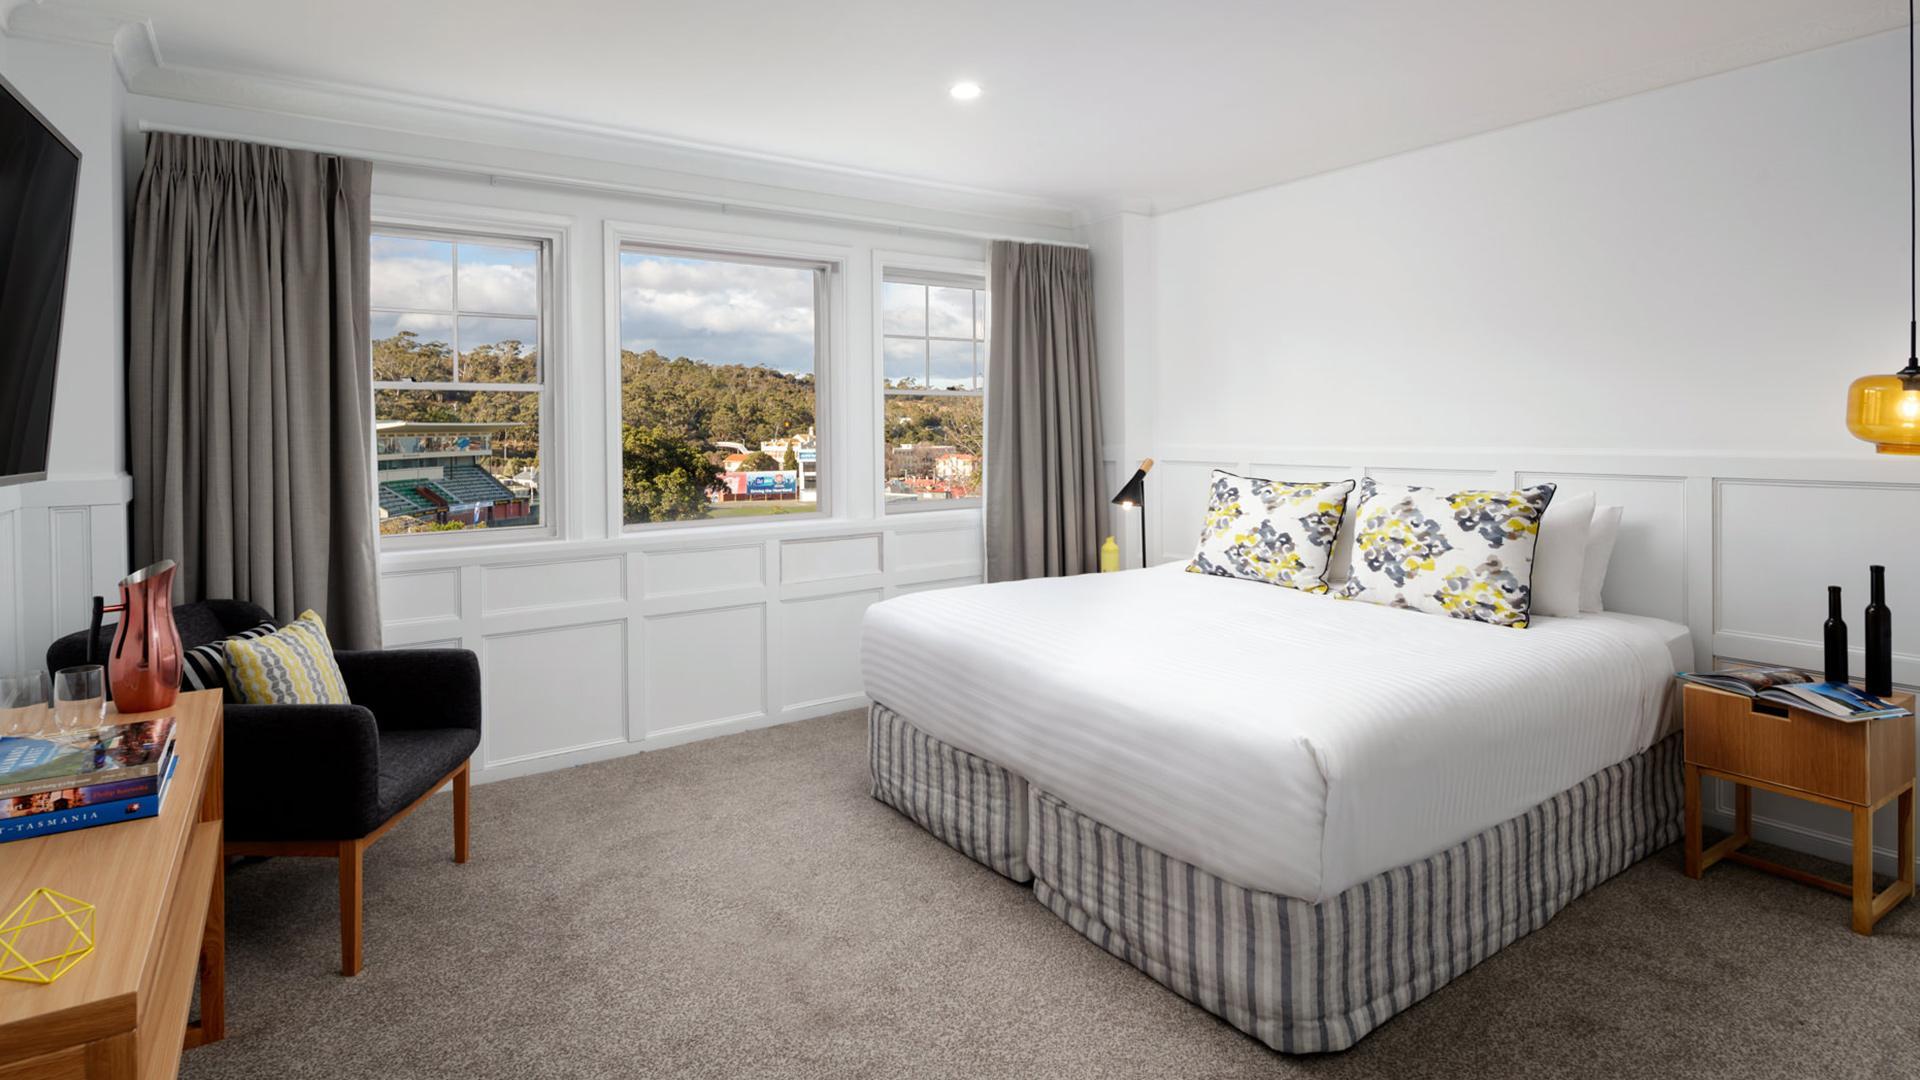 Manor King Room image 1 at Rydges Hobart by Hobart City Council, Tasmania, Australia